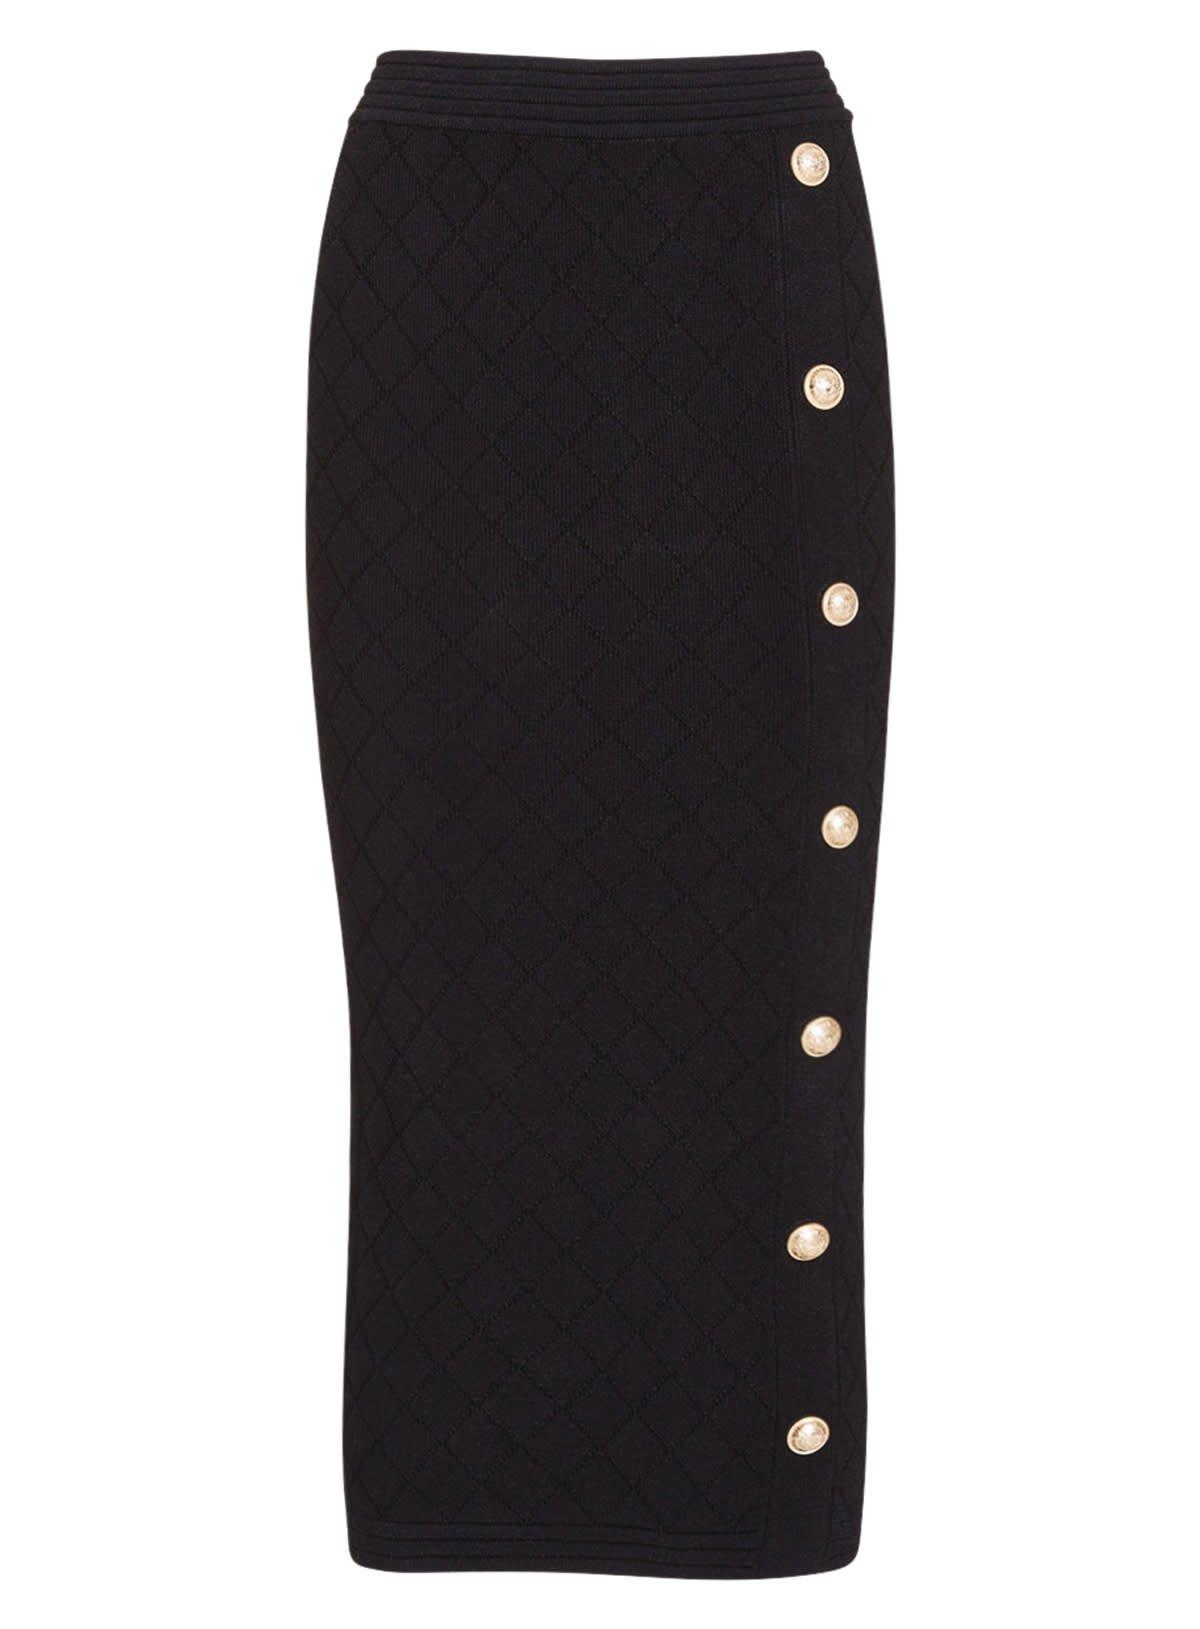 Balmain Long High-waisted Black Knit Skirt In Black